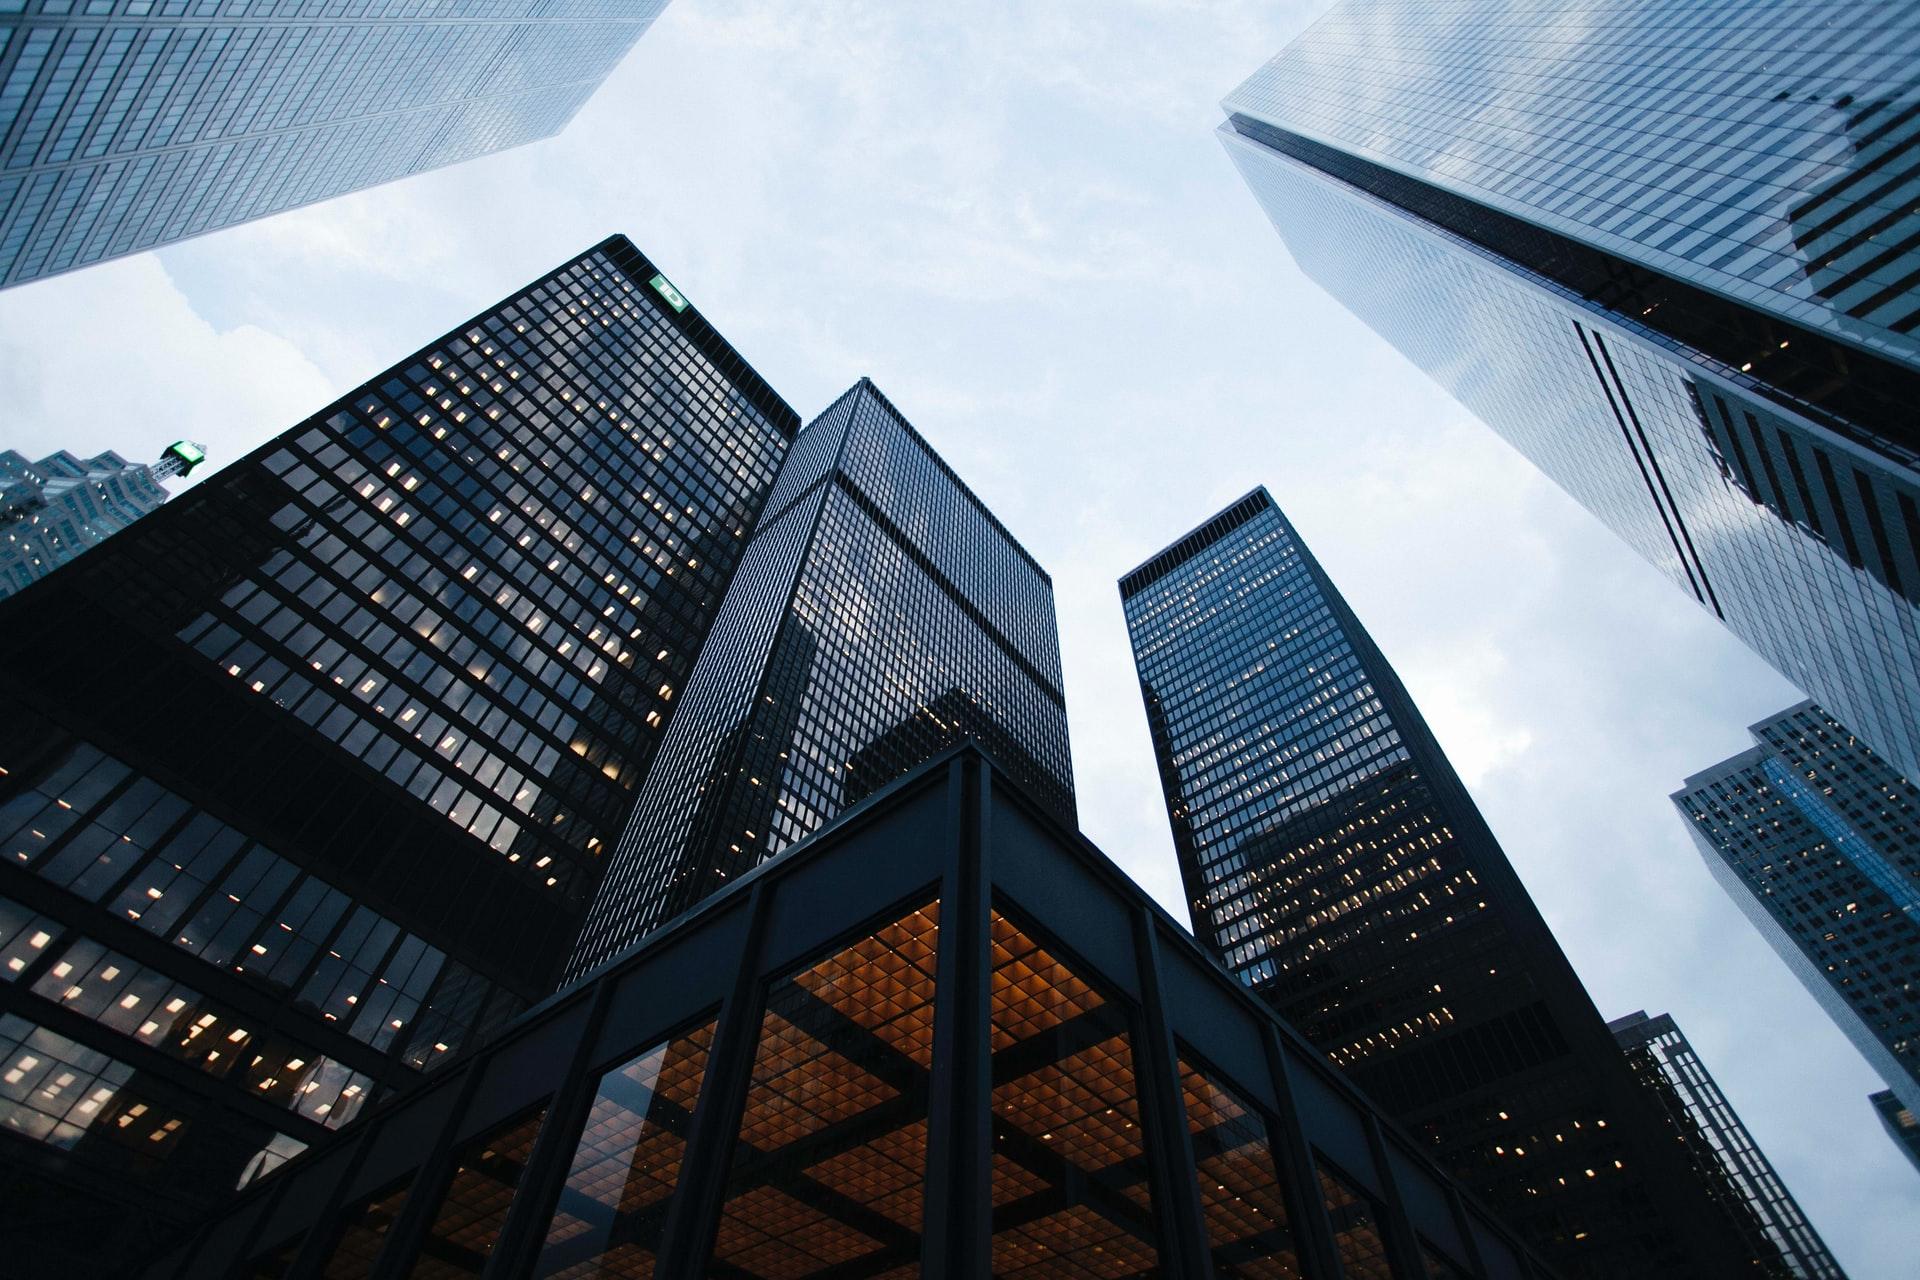 8 Must-have Features for Enterprise Digital Signage